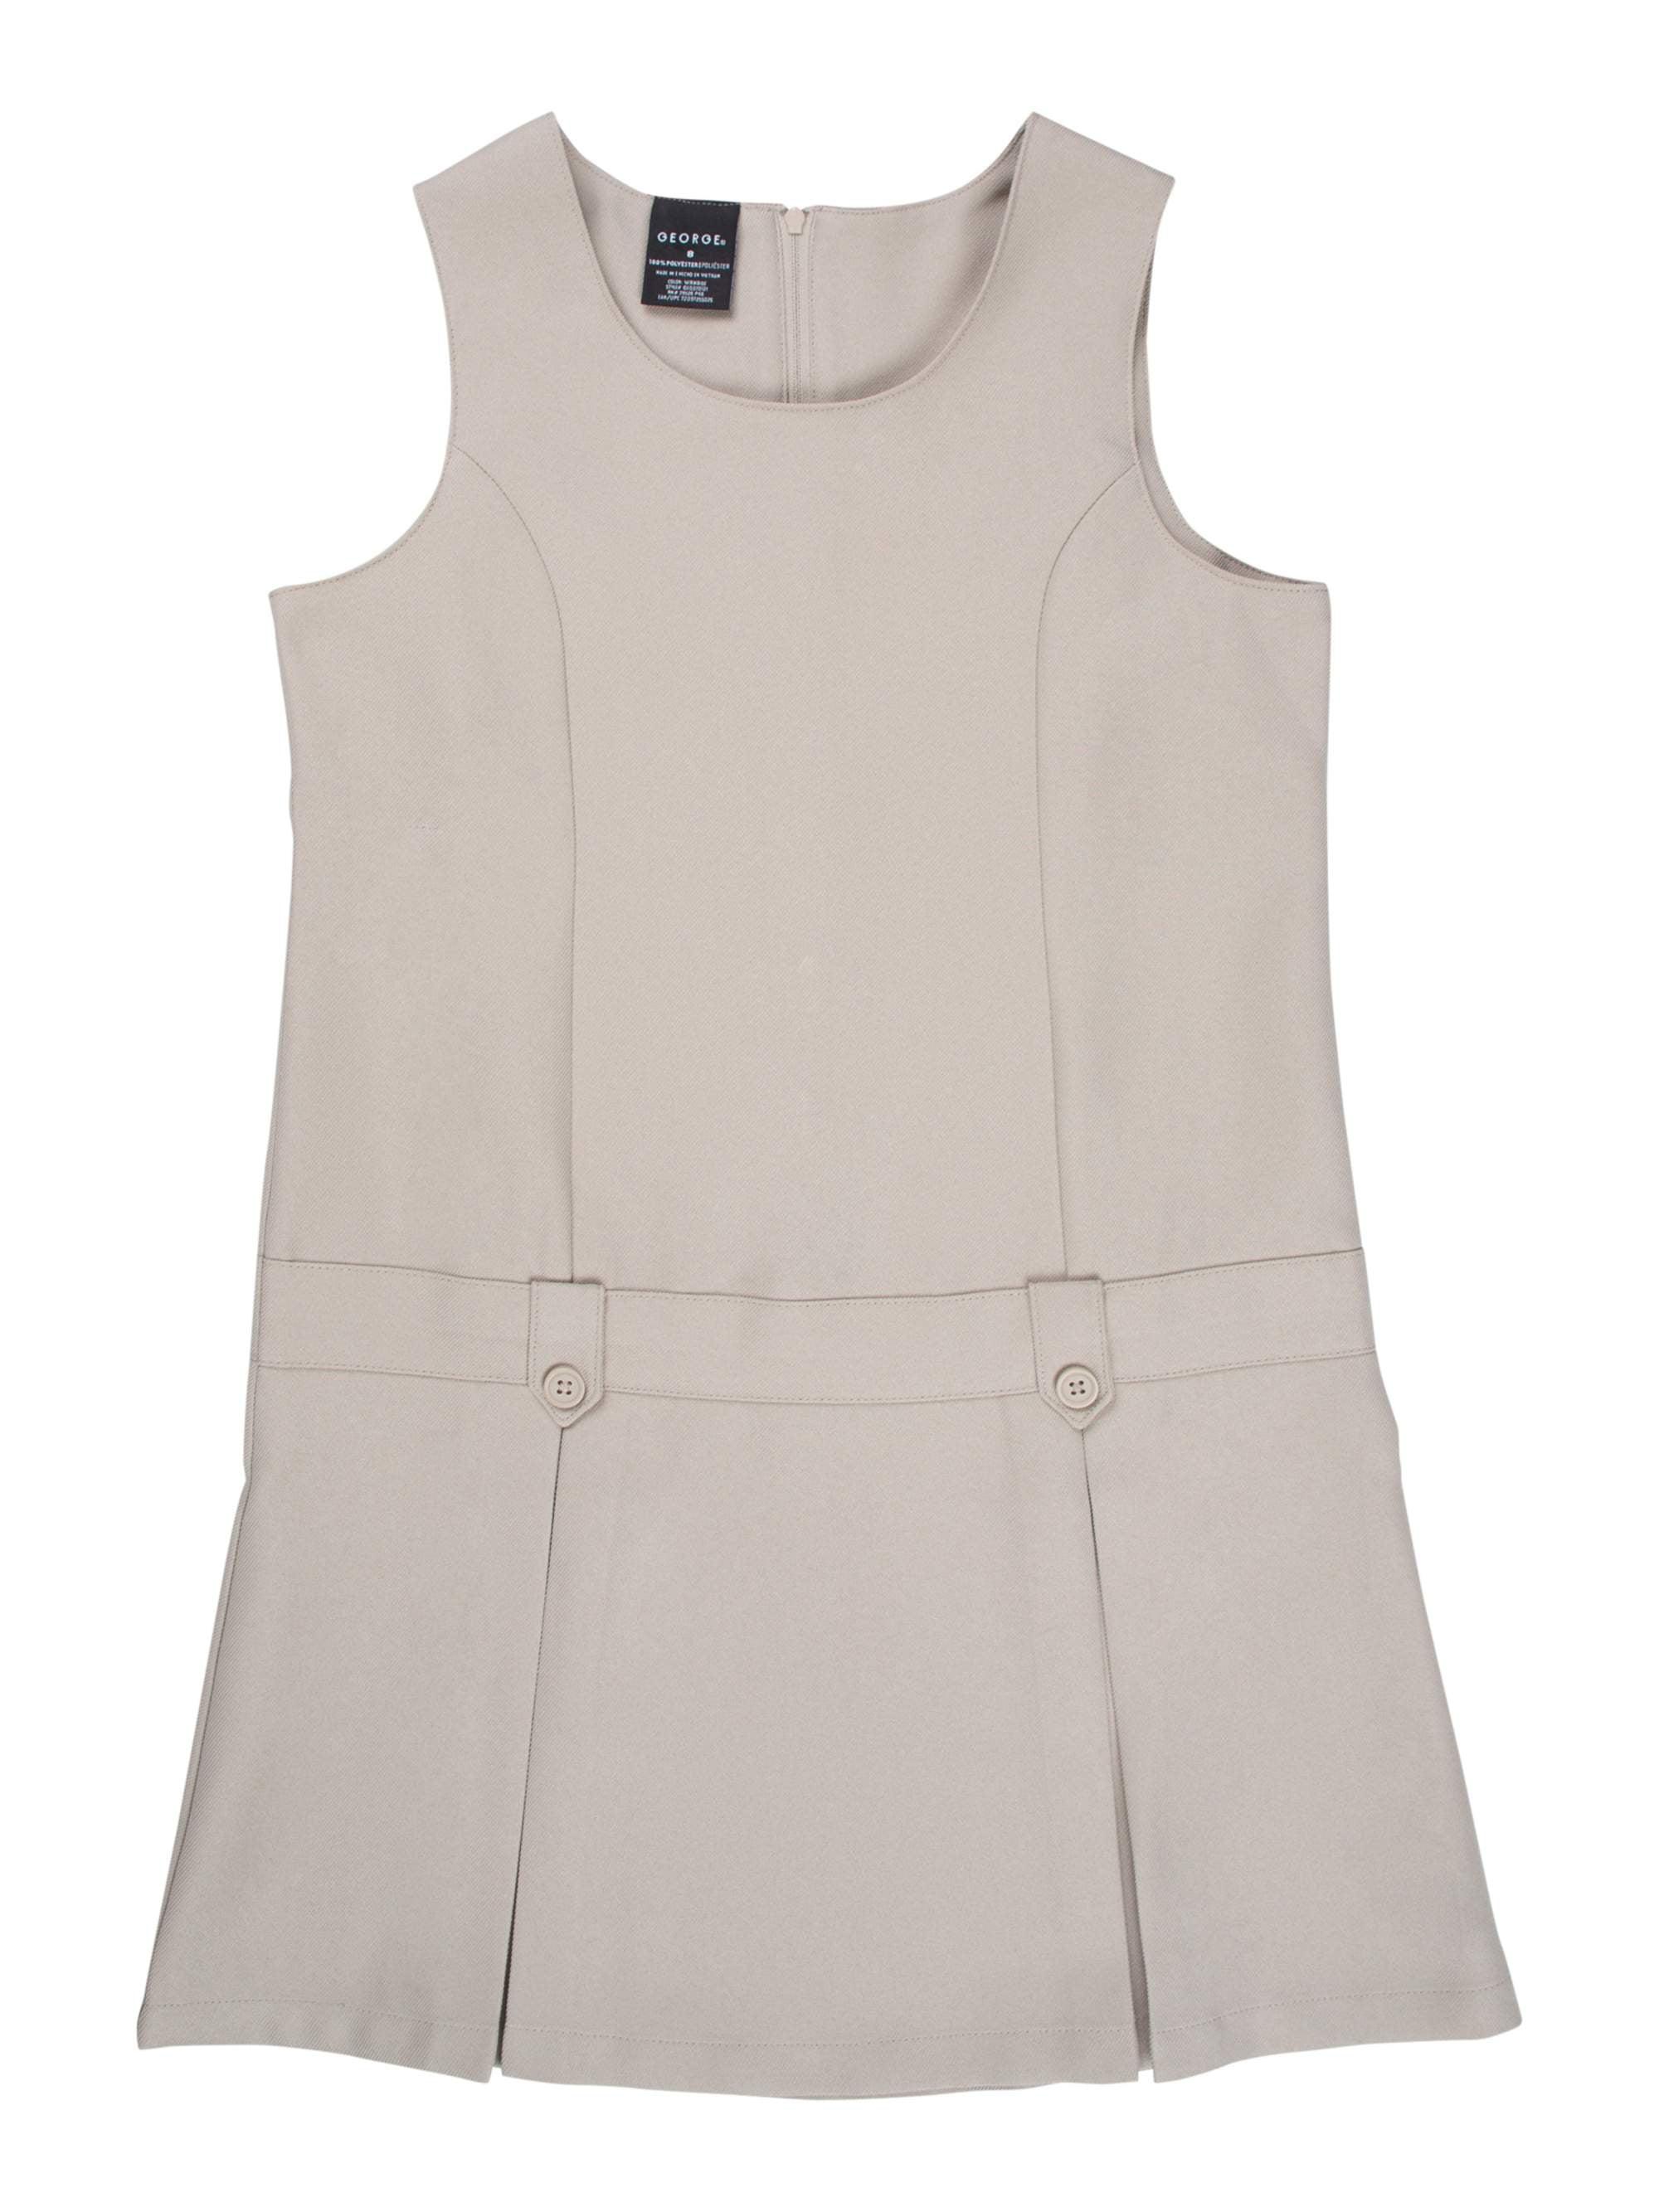 Girls' School Uniform Belted Jumper with Buttoned Belt Loops